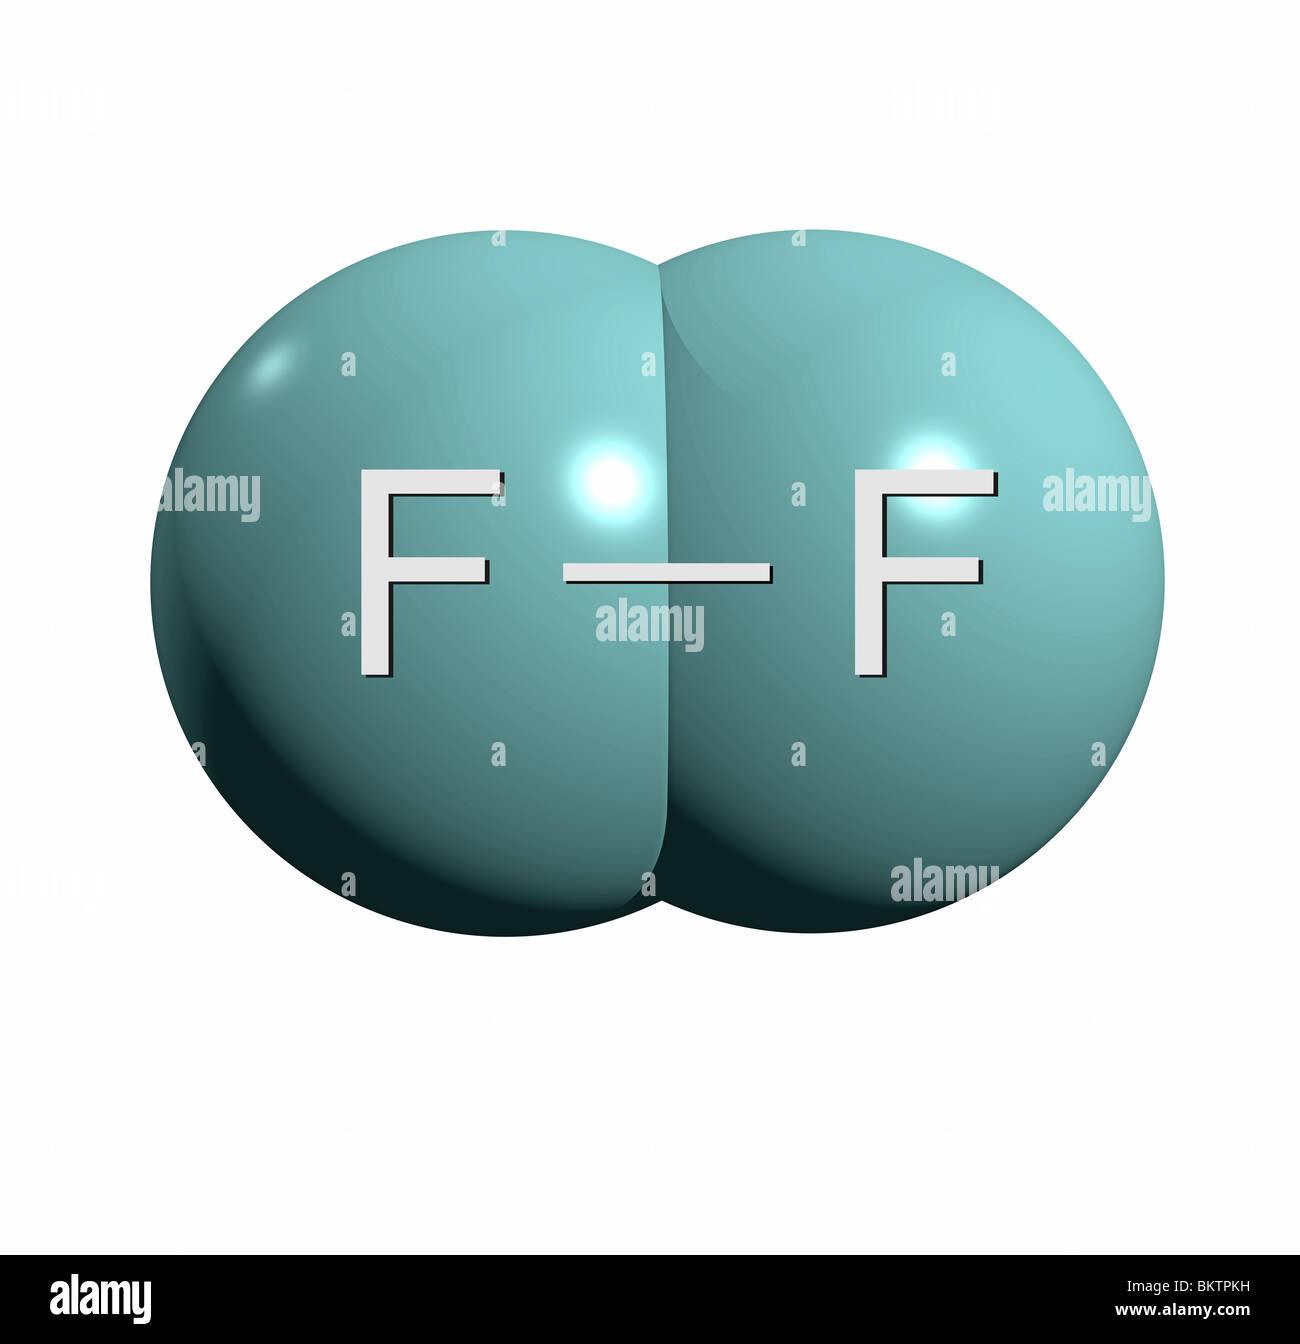 Fluormolekül F2 / fluorine molecule F2 Stock Photo ...